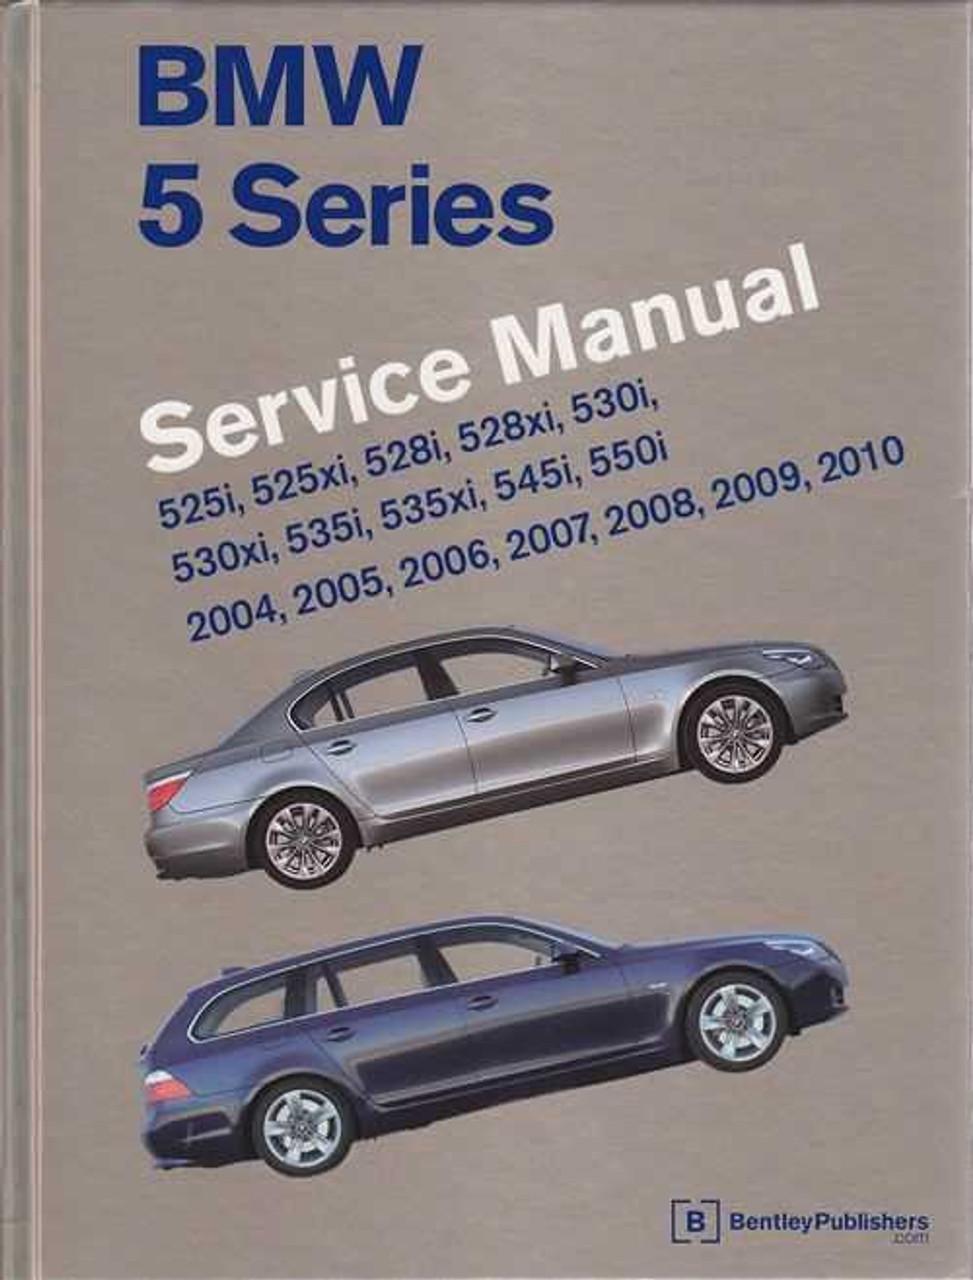 BMW 5 Series (E60, E61) 2004 - 2010 Workshop Manual